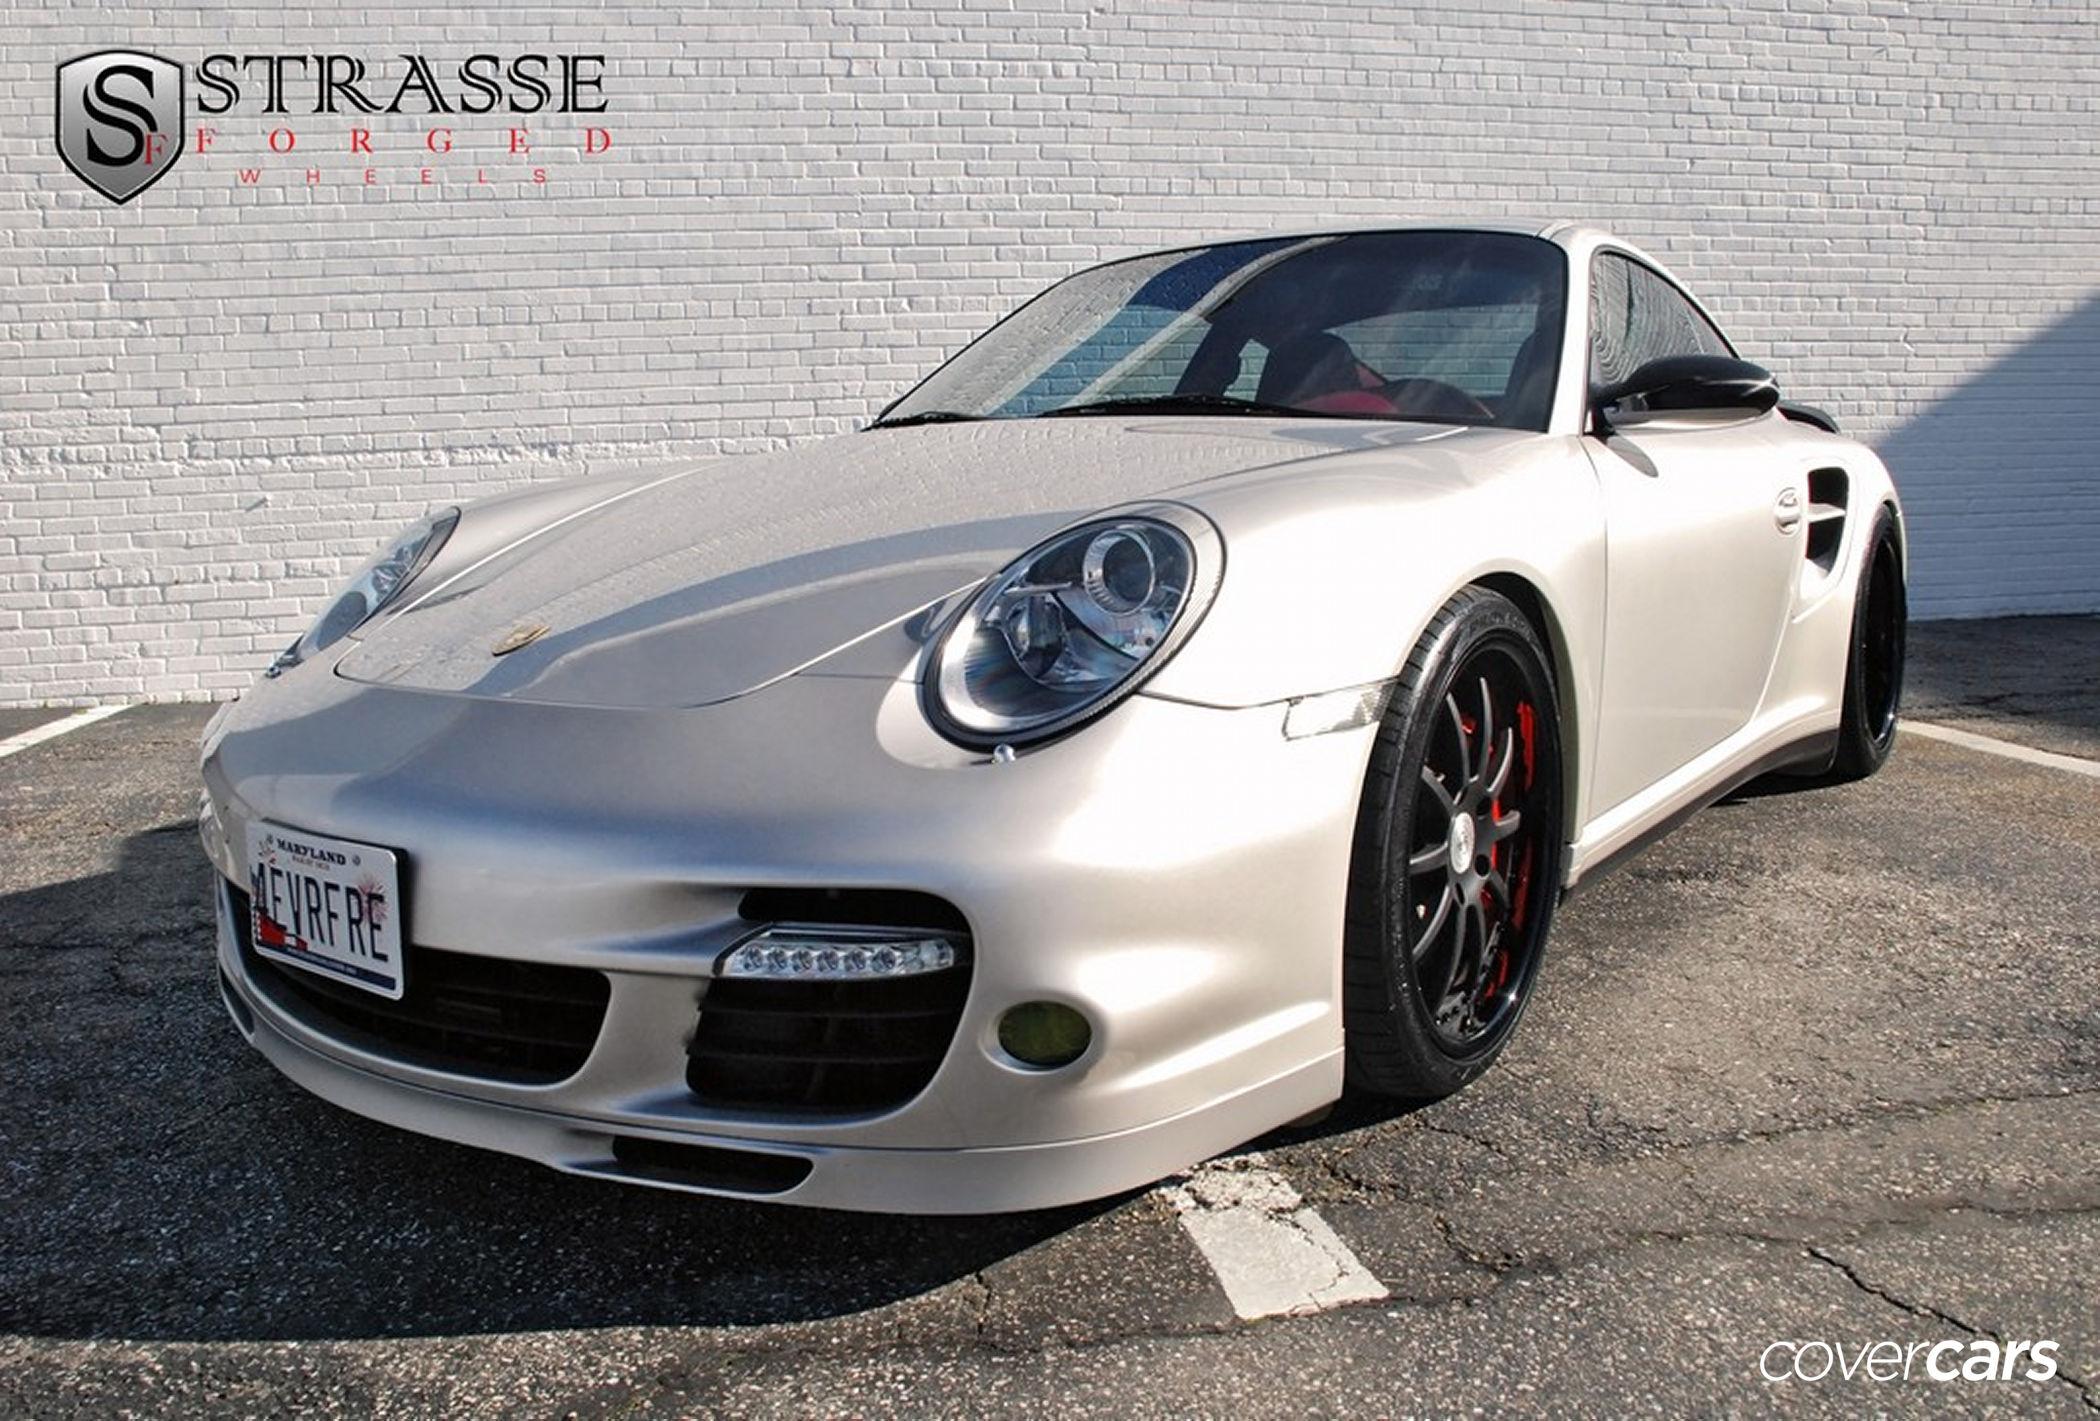 2011 silver Porsche 911 Turbo wallpapers